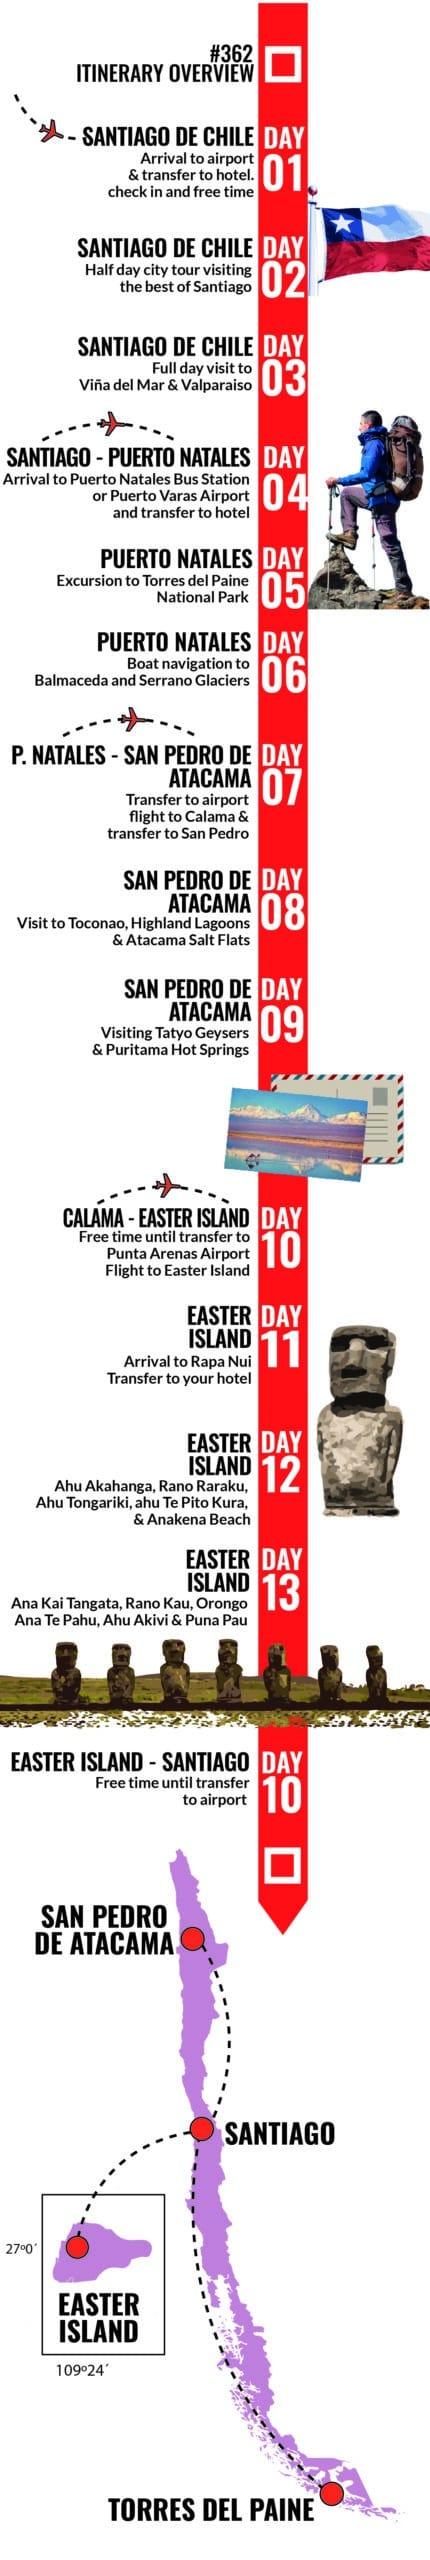 Santiago de Chile, San Pedro de Atacama, Torres del Paine and Easter Island - RipioTurismo DMC for Argentina and Chile